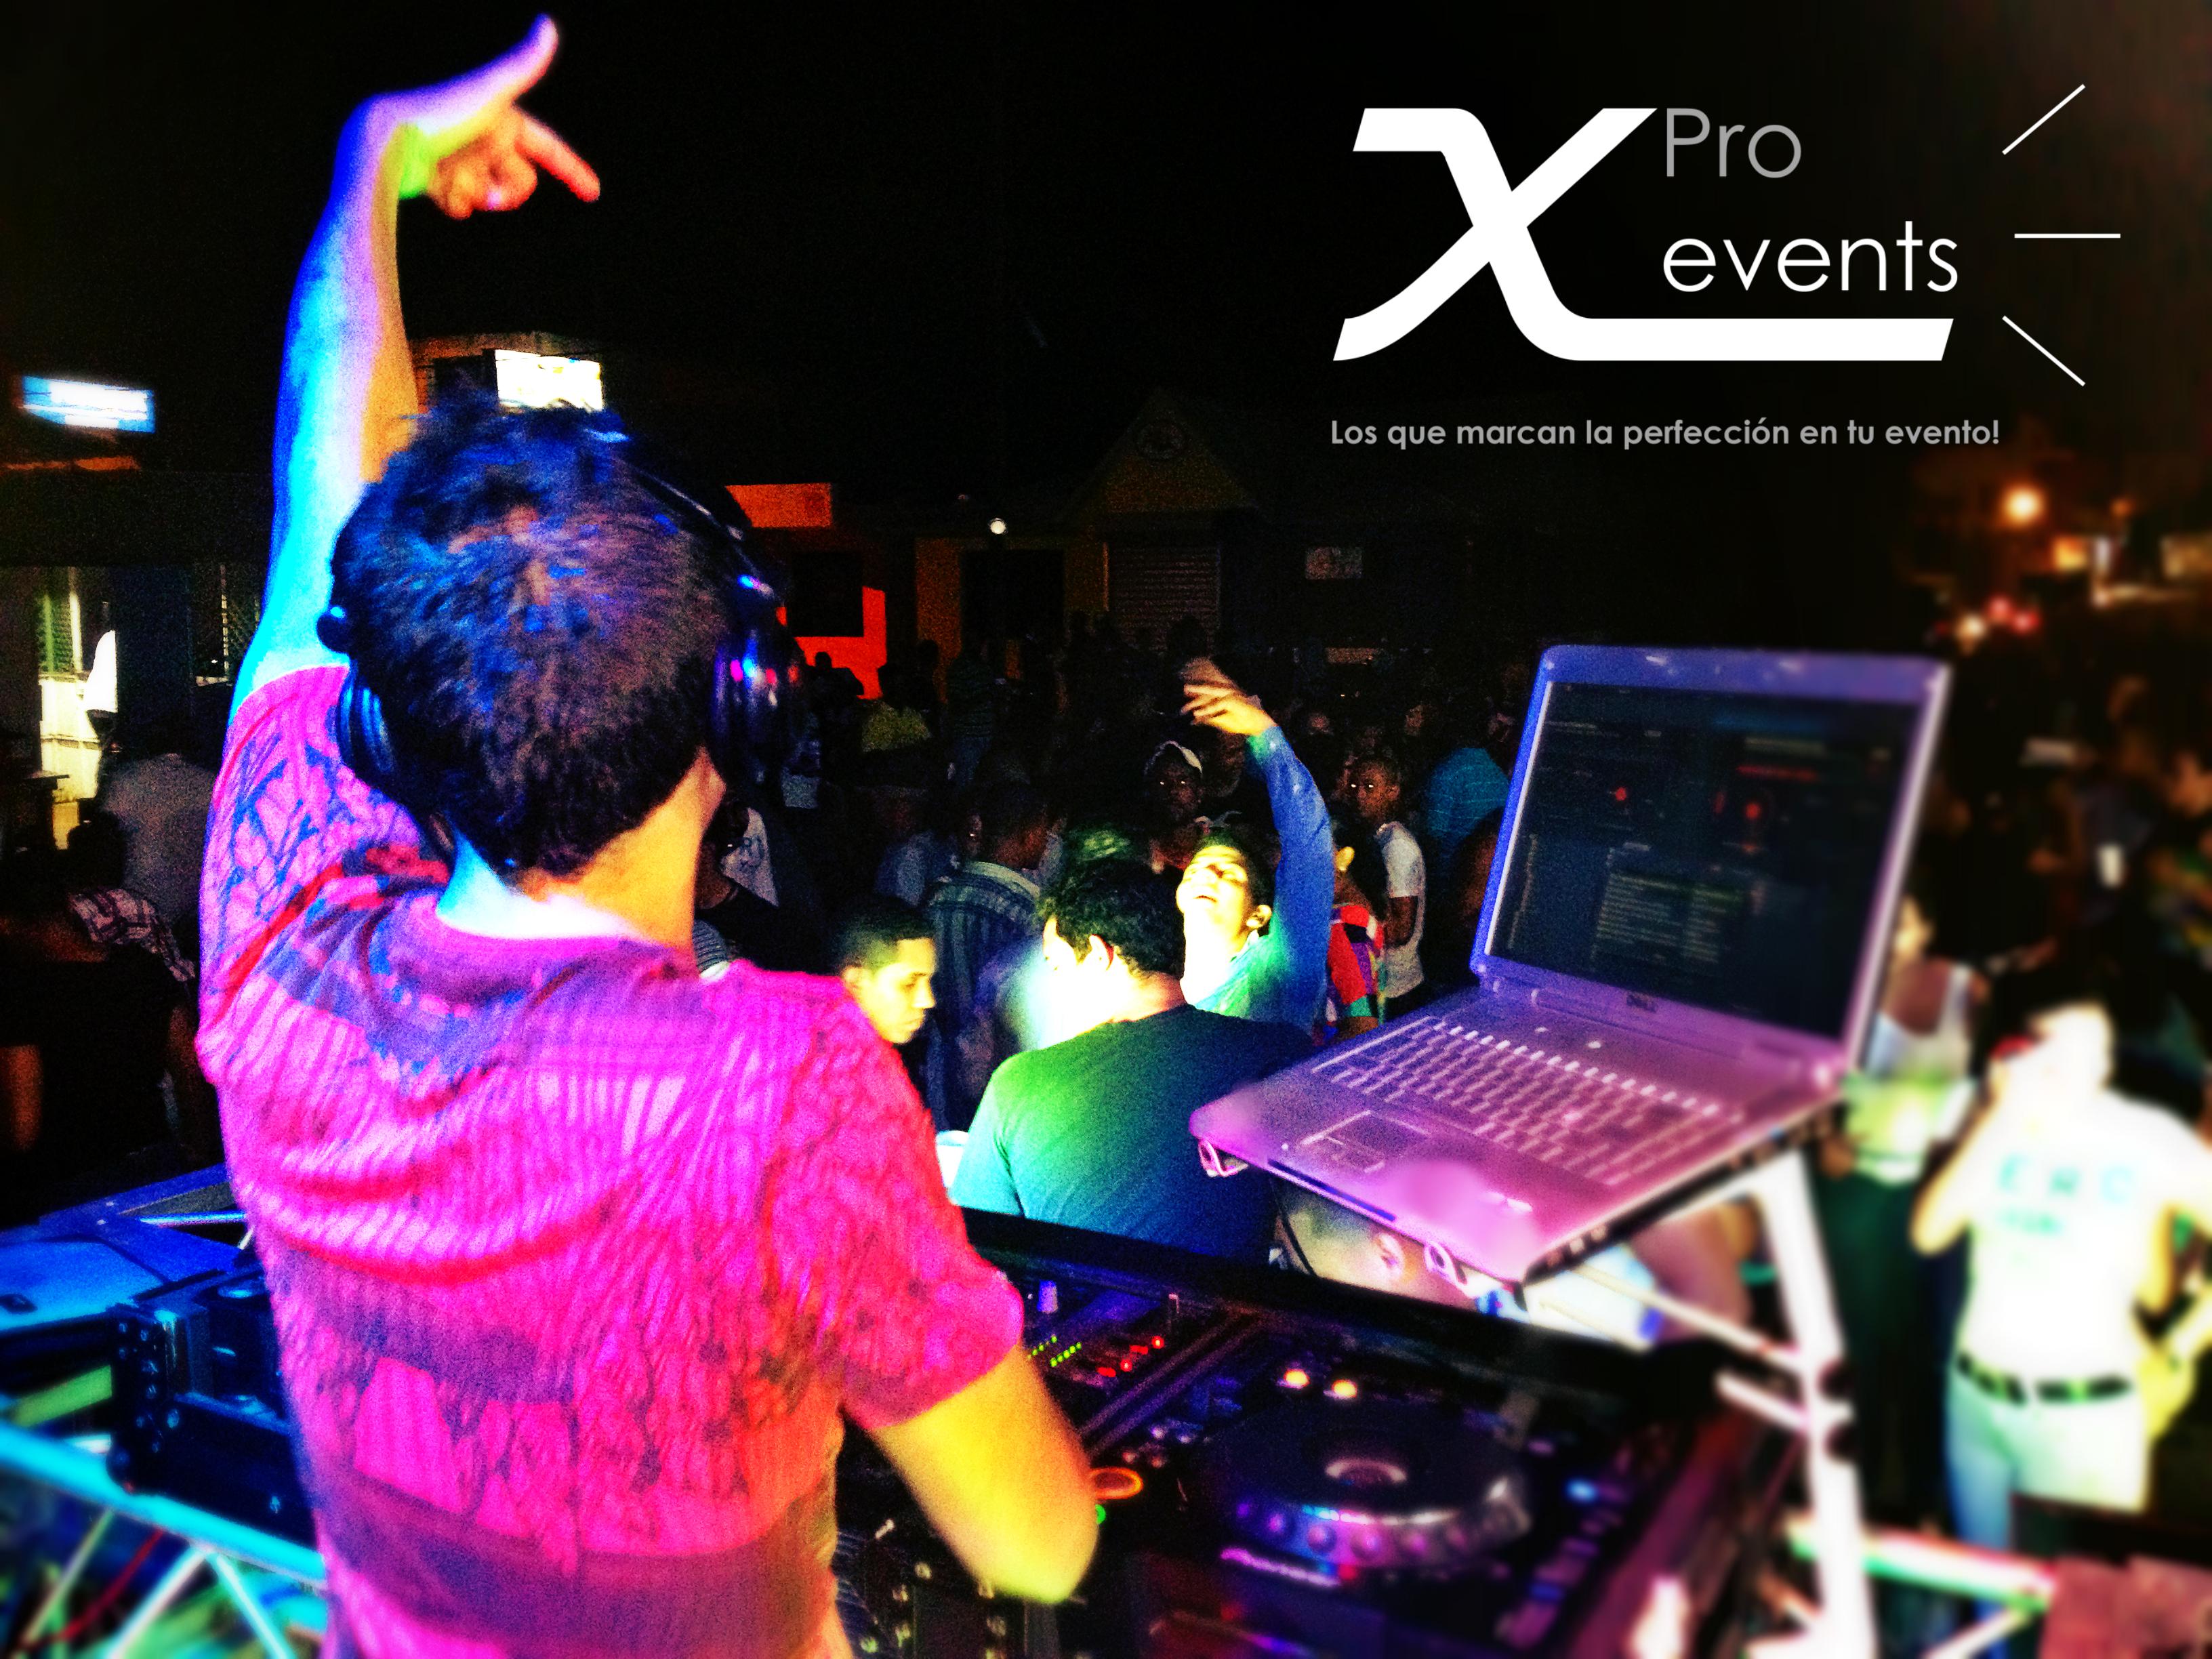 X Pro events  - 809-846-3784 - Los mejores Djs.JPG